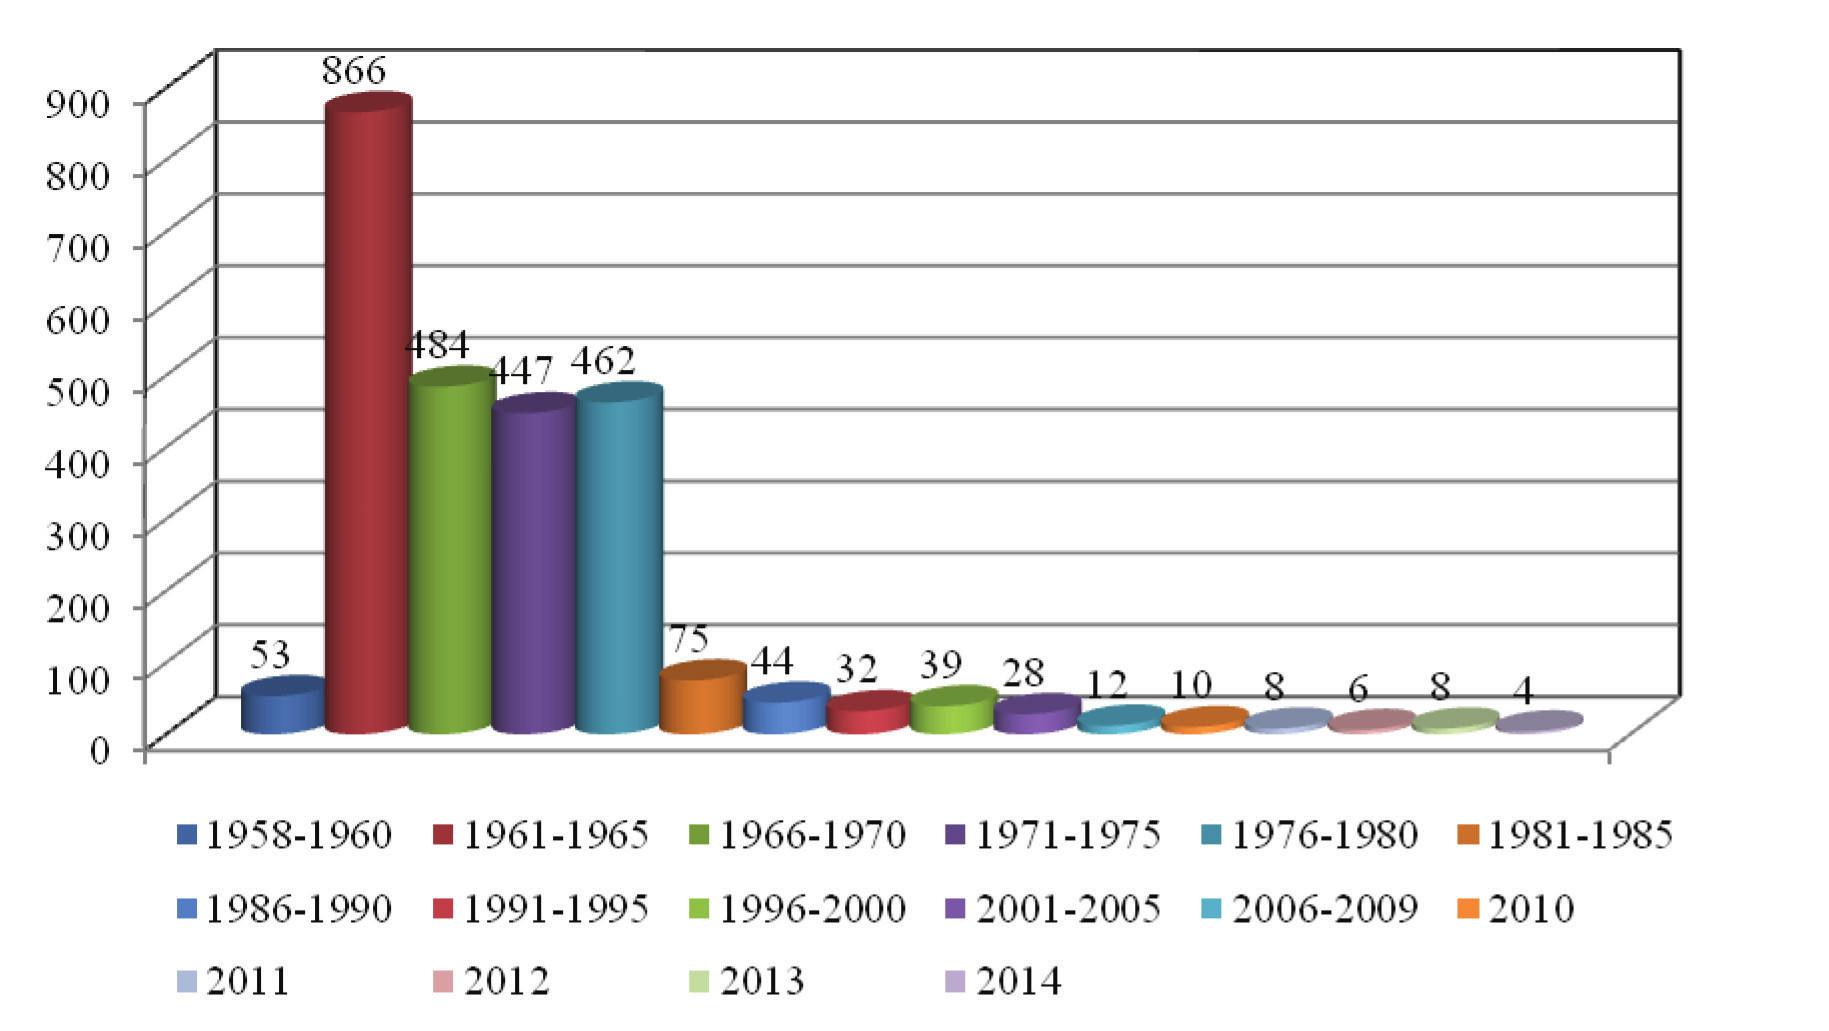 Trichophycia v ČR – 5leté intervaly/ průměr za 1 rok, od r. 2010 počet/rok